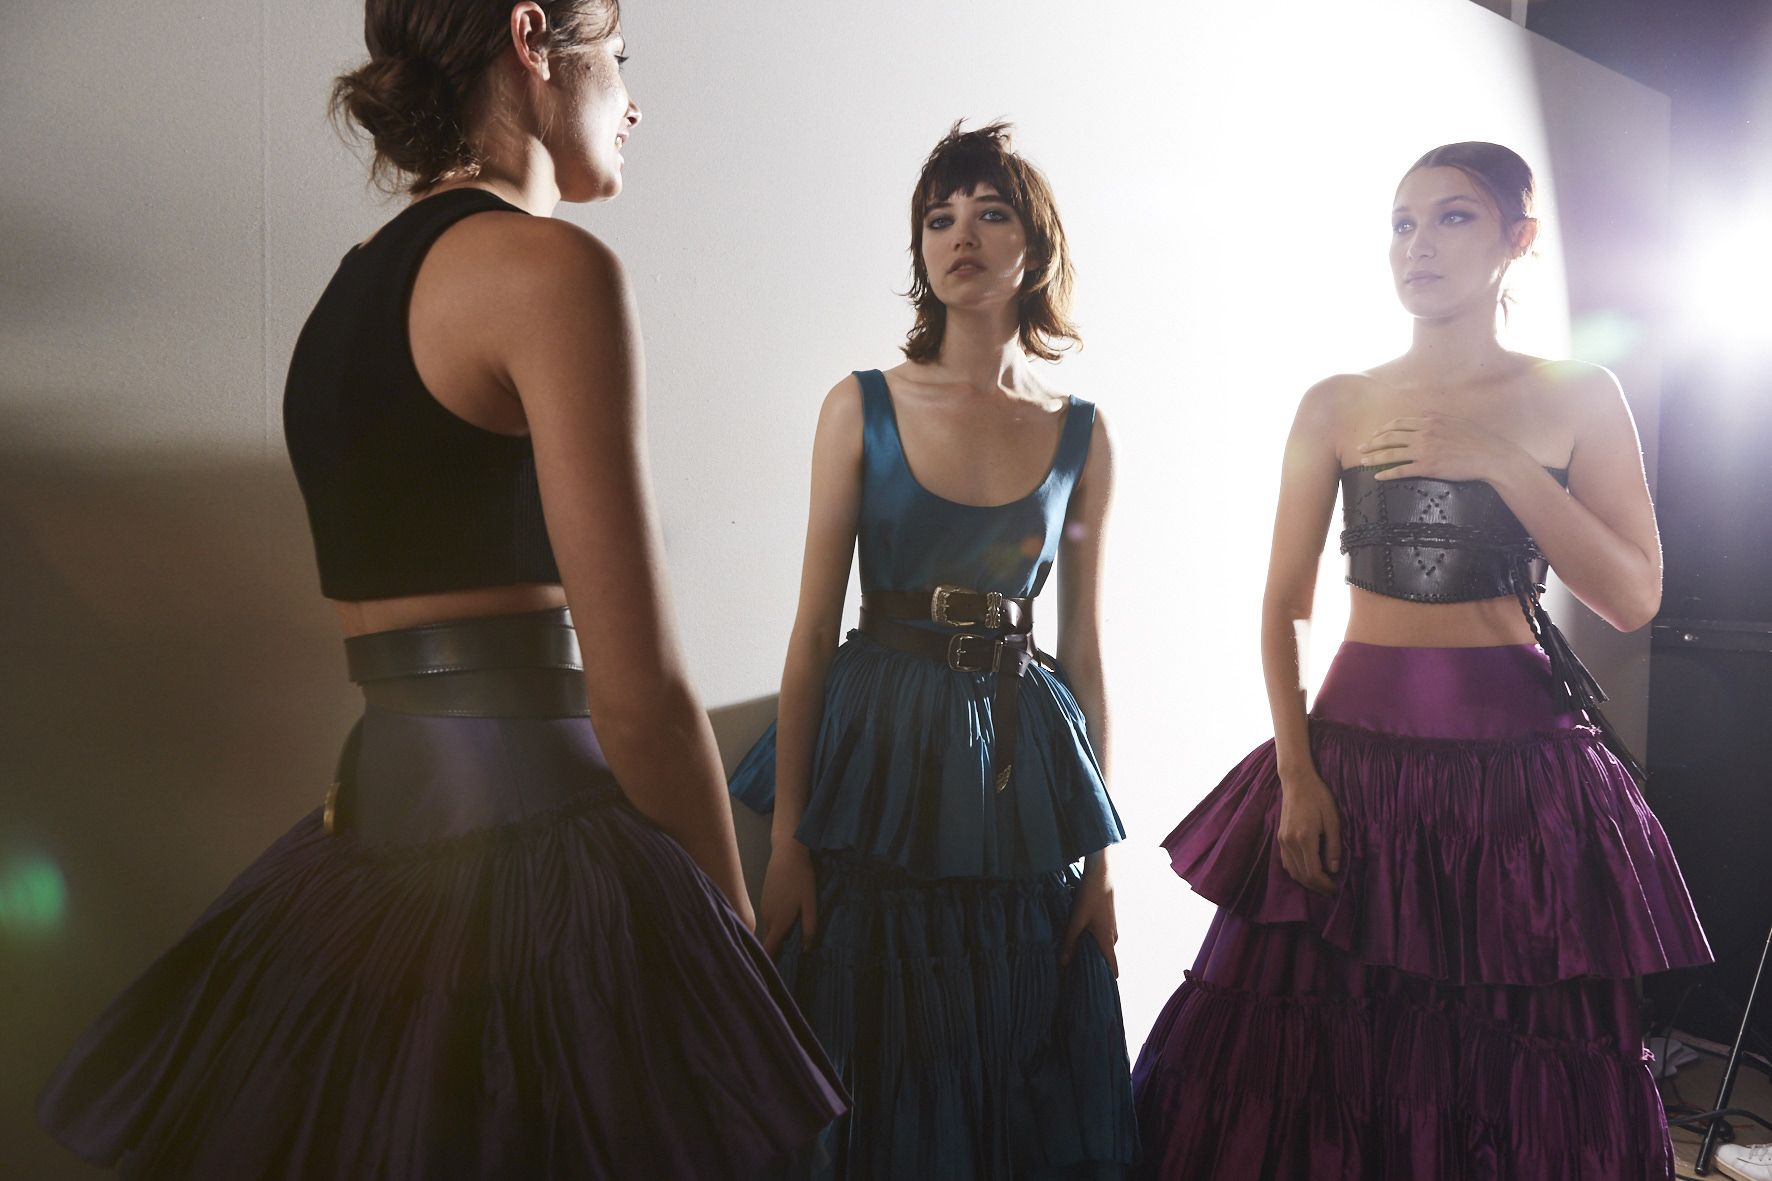 Fashion Models Alberta Ferretti Womenswear Backstage